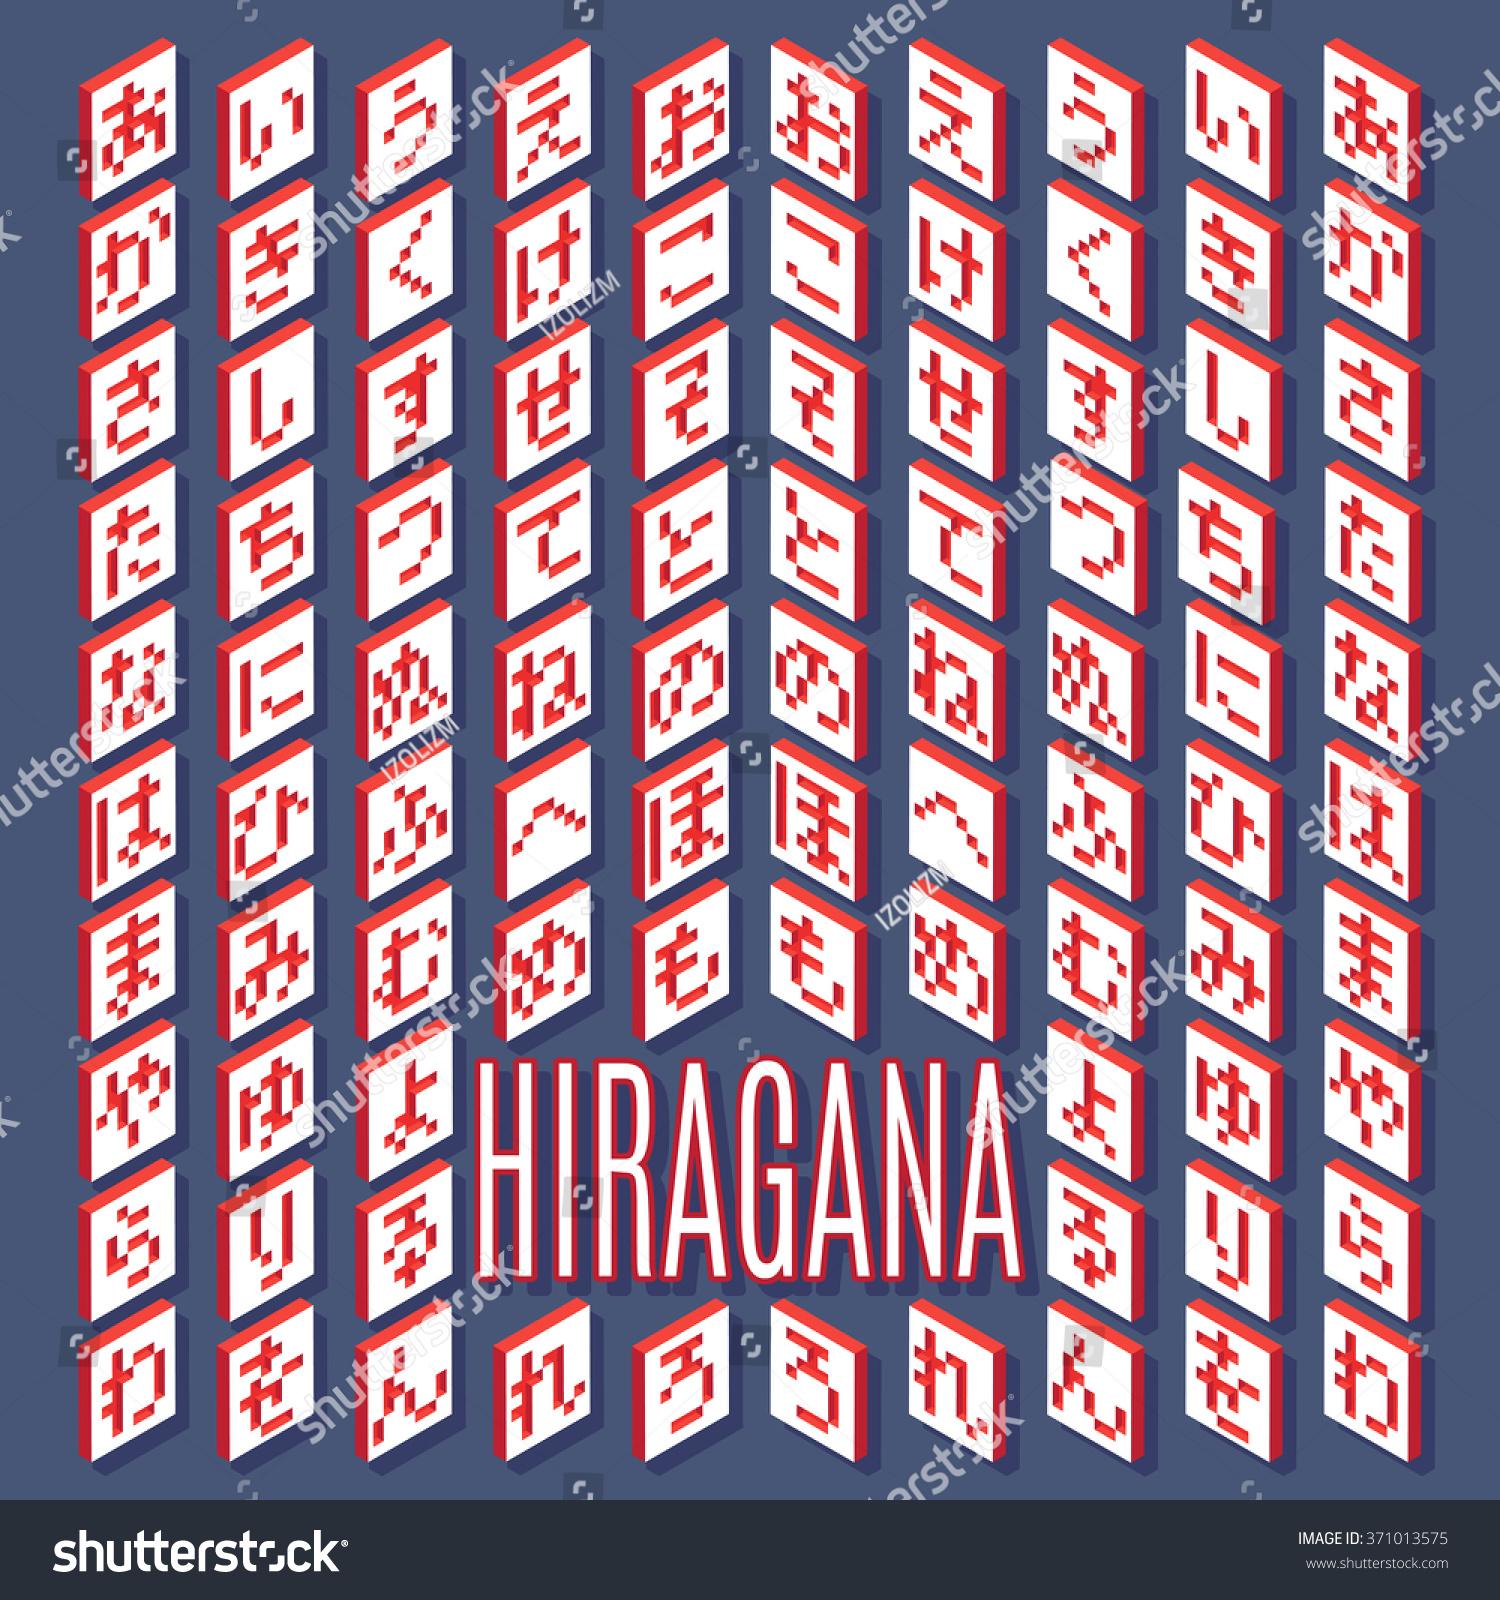 Hiragana Syllabary: Pixel Japanese Hiragana Alphabet Vector Font Stock Vector